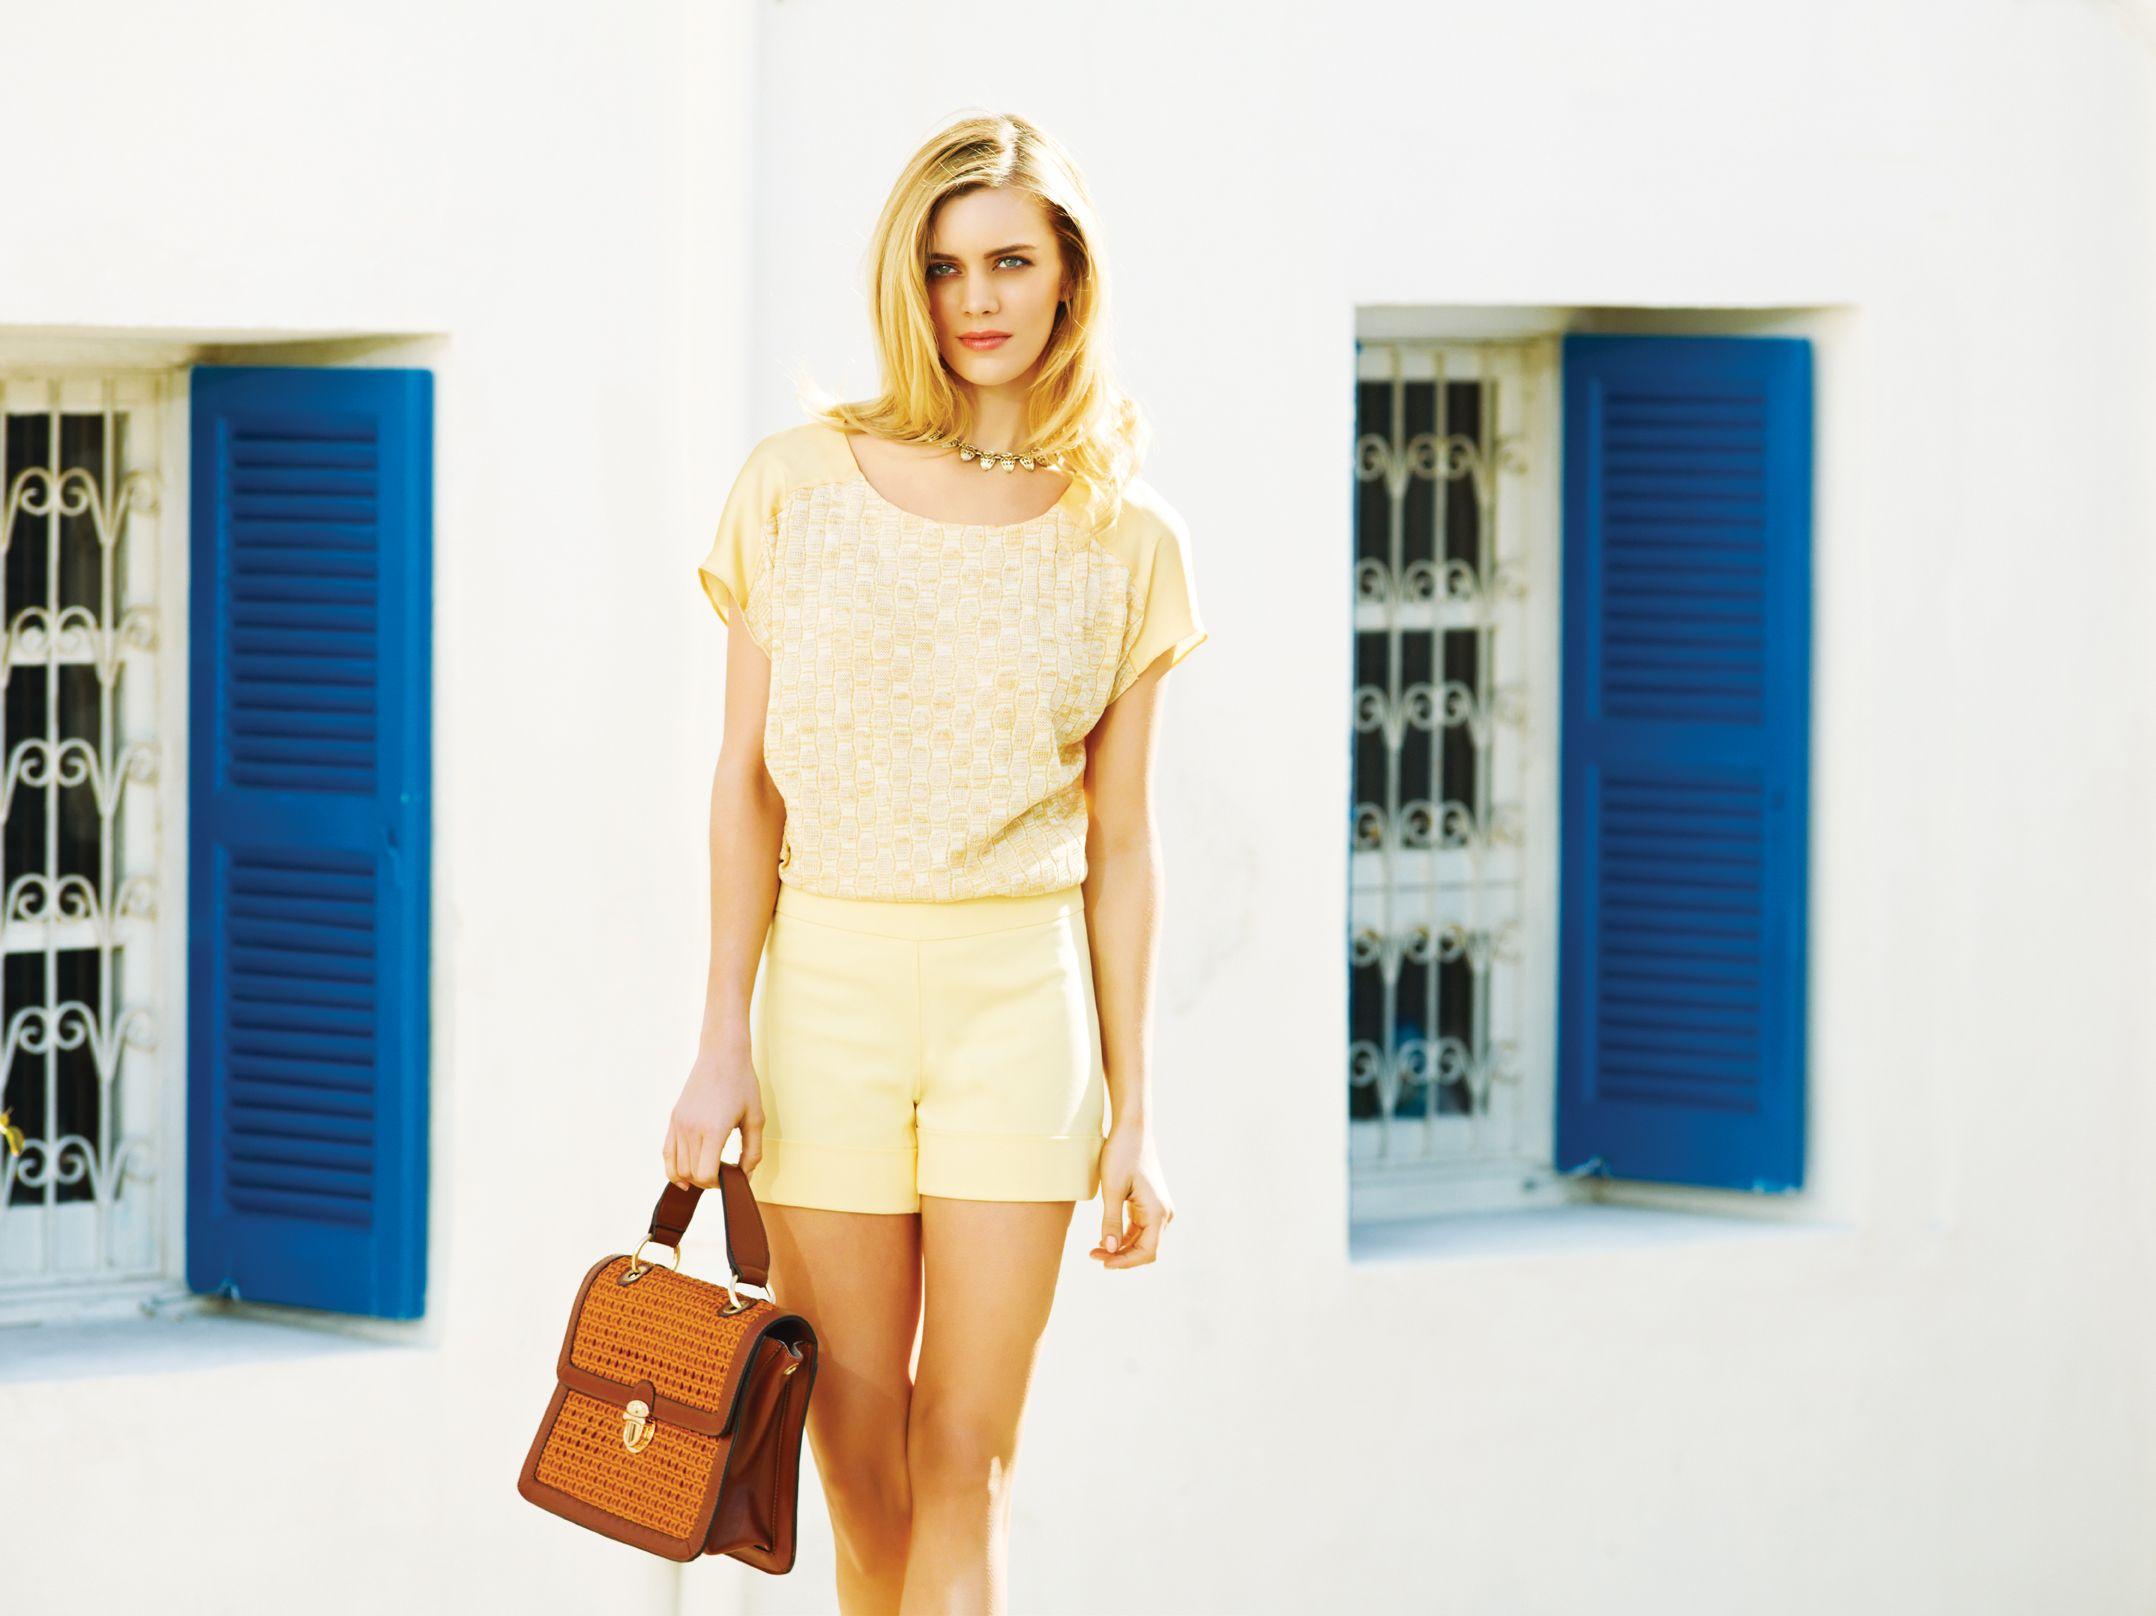 Moda Dunyasinin Guclu Markasi Adl Working Chic Koleksiyonuyla 2013 E Hizli Bir Giris Yapiyor Koleksiyonun Fotograflarini Unlu Mod Fashion Mini Dress Dresses